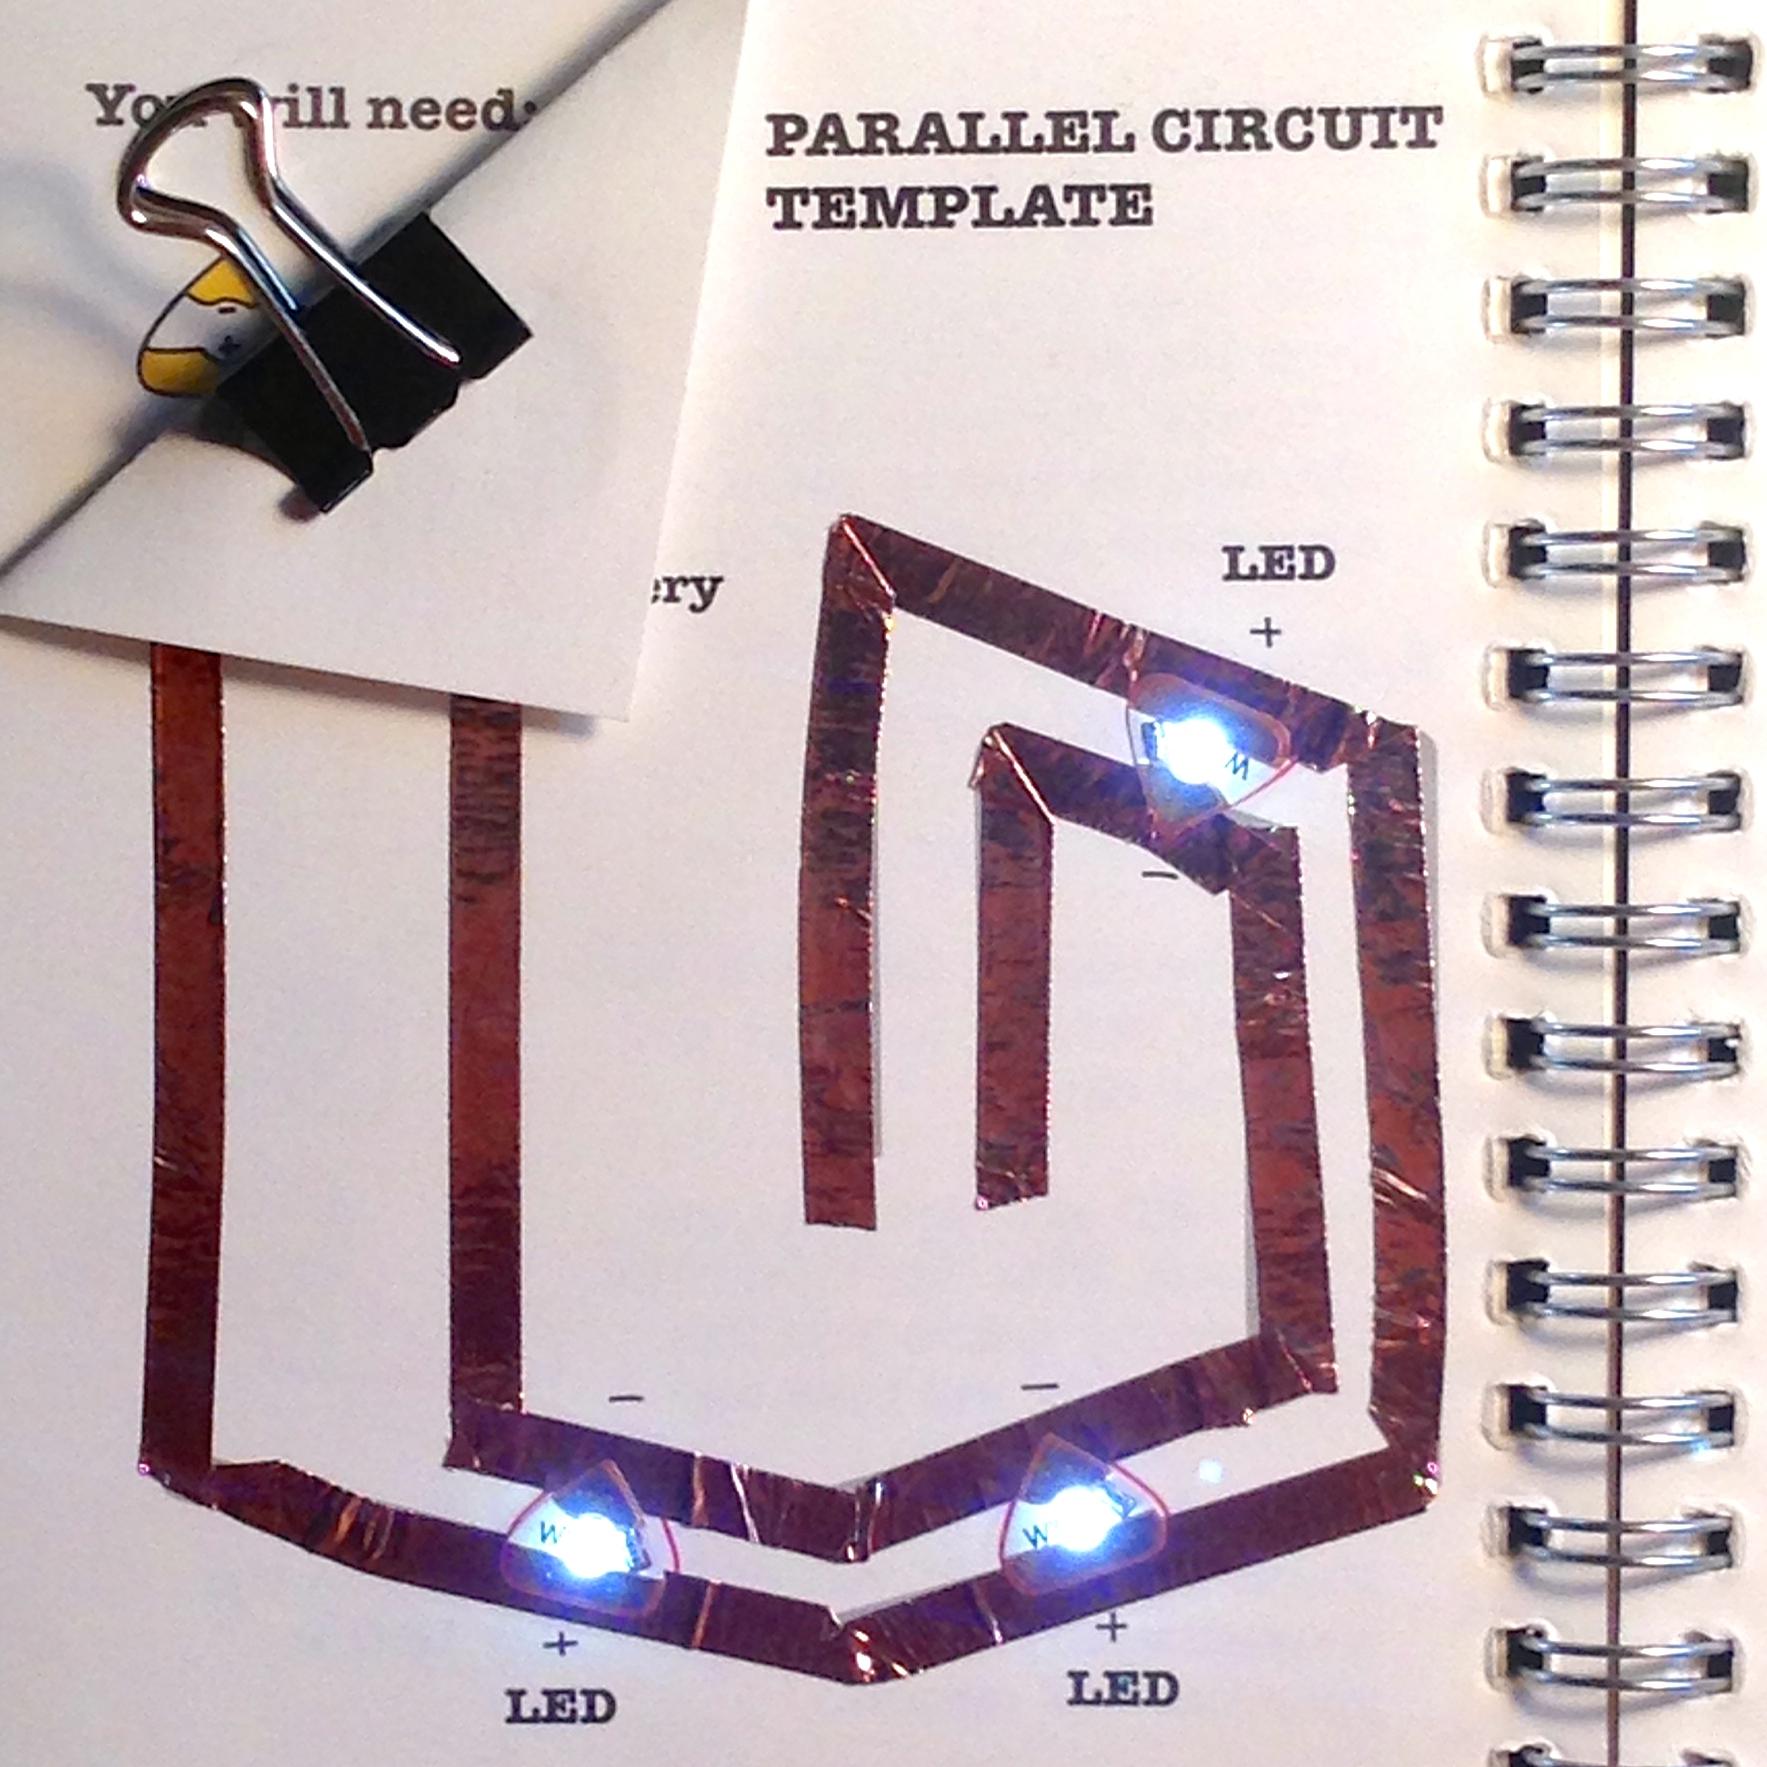 light sensor switch circuit diagram roto phase wiring learn - chibitronics